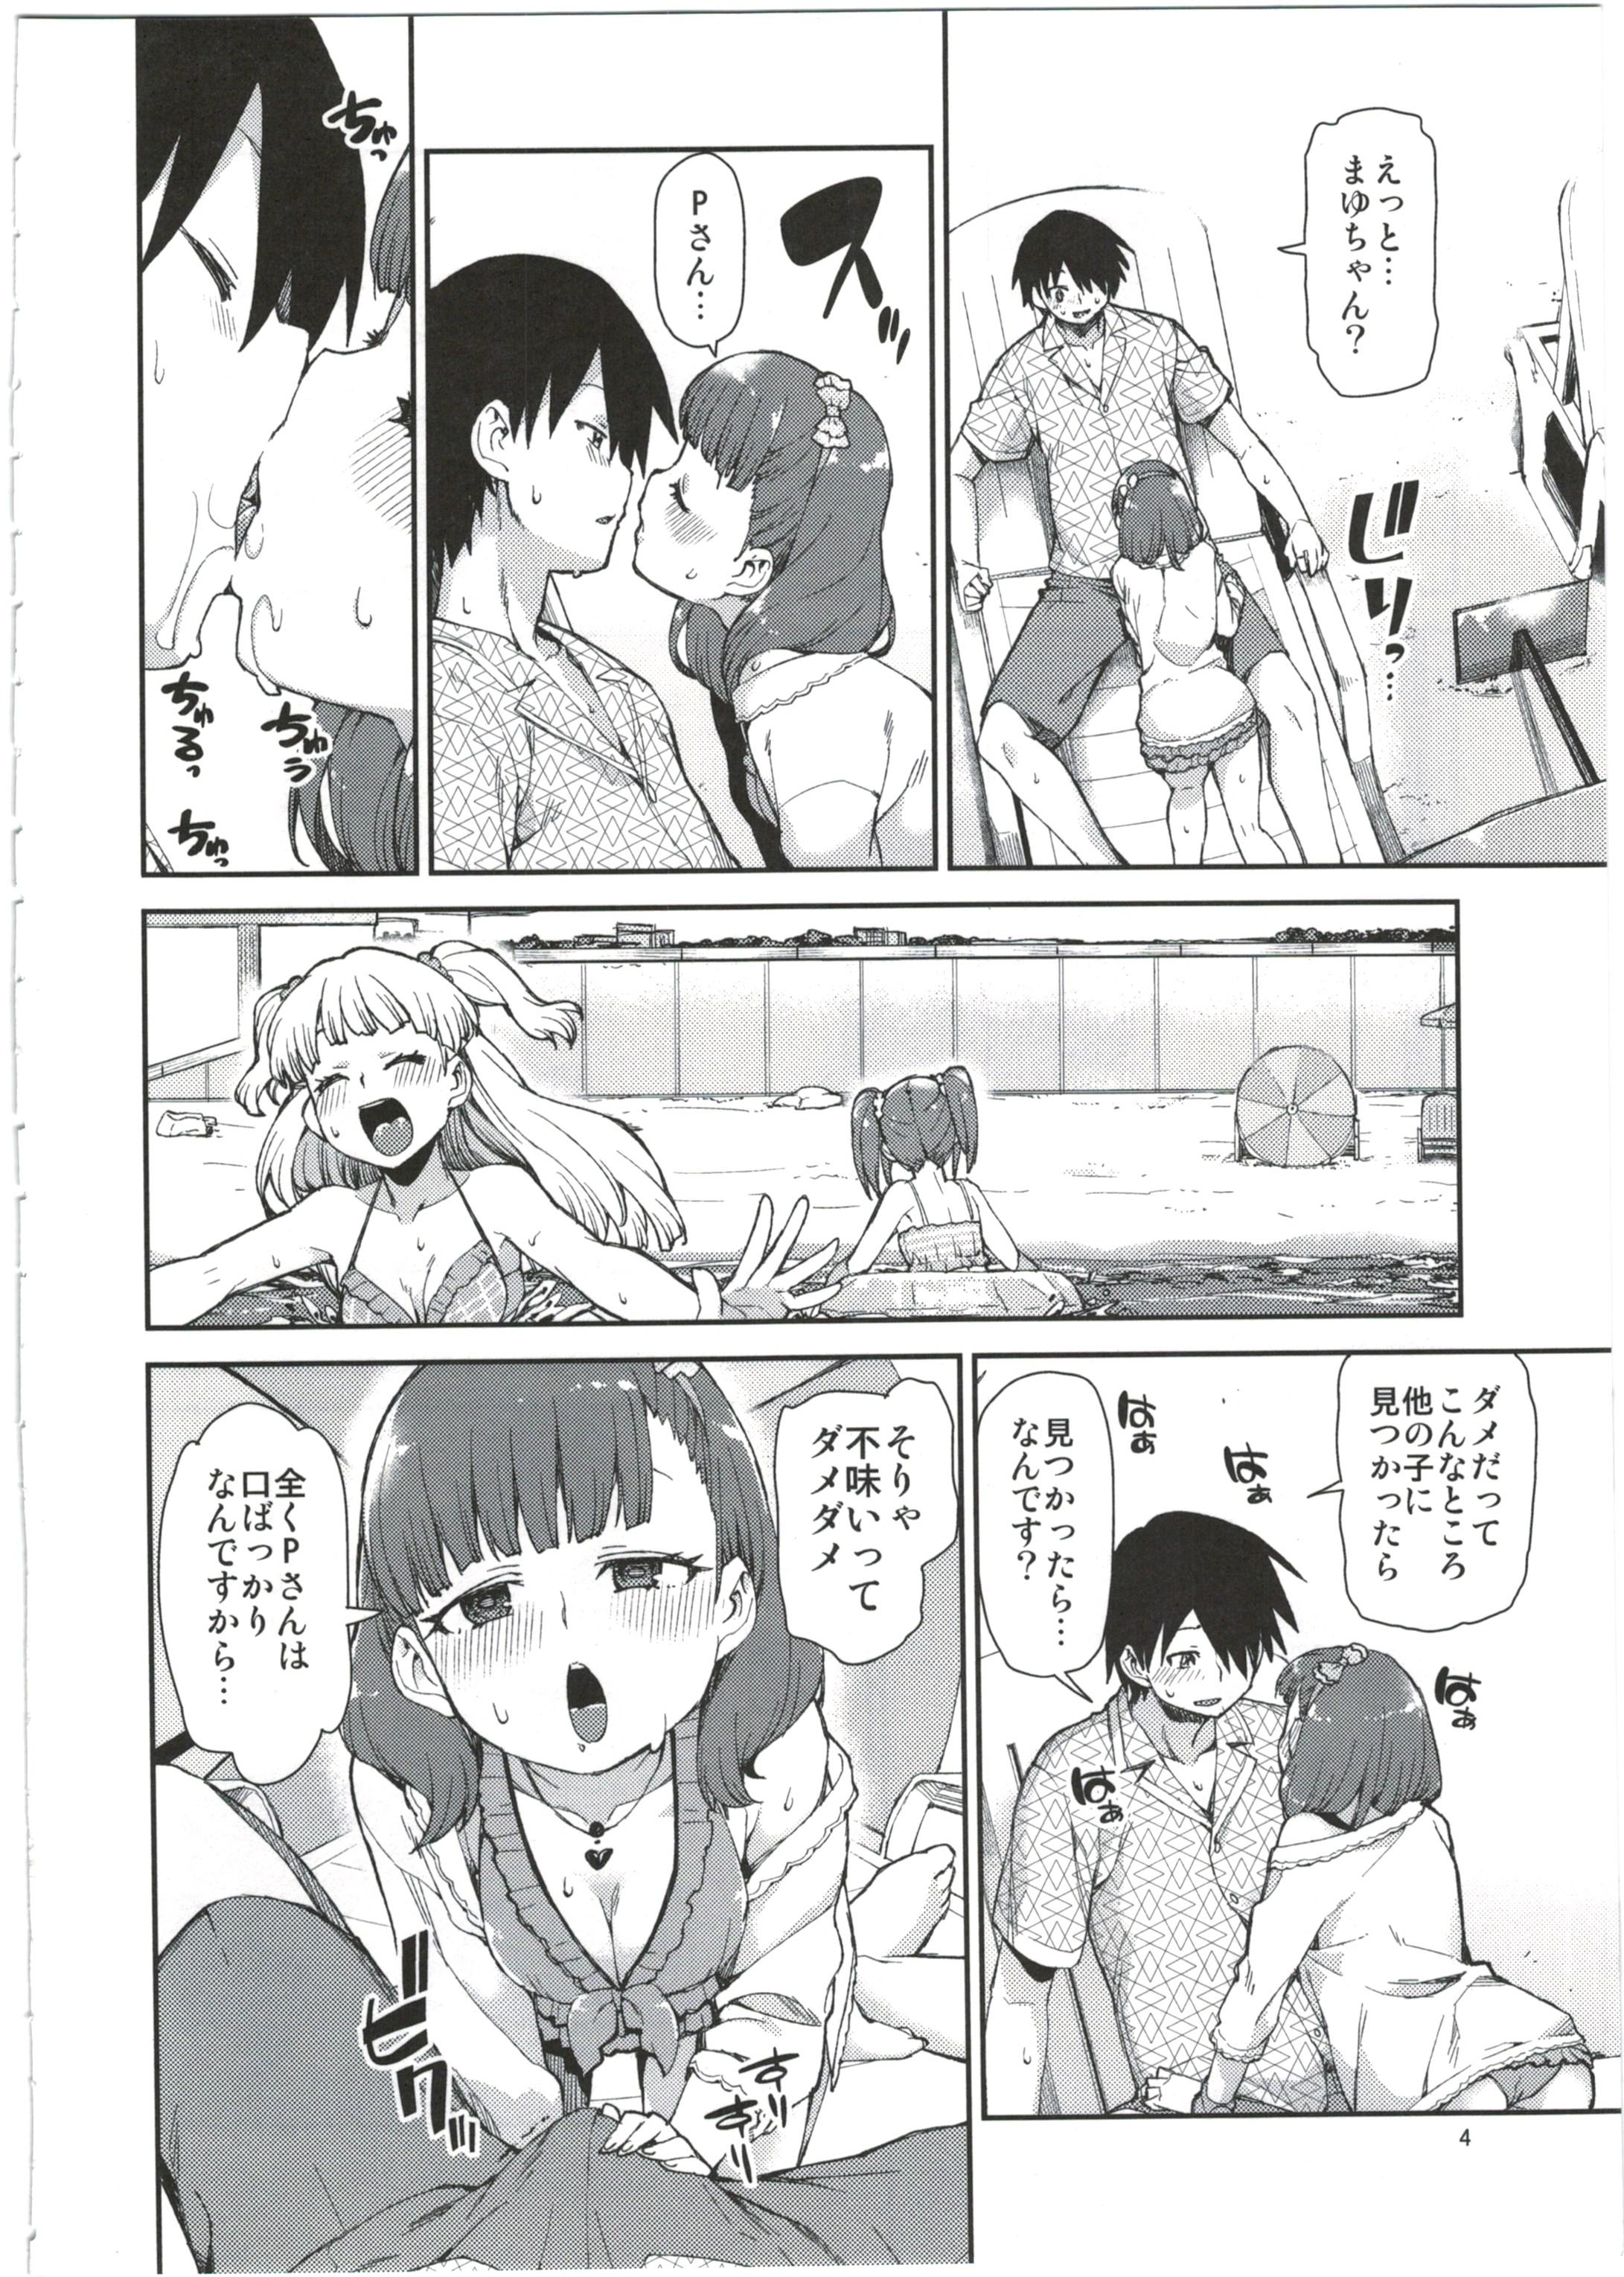 Mayu wa Ima Tottemo Shiawase 5